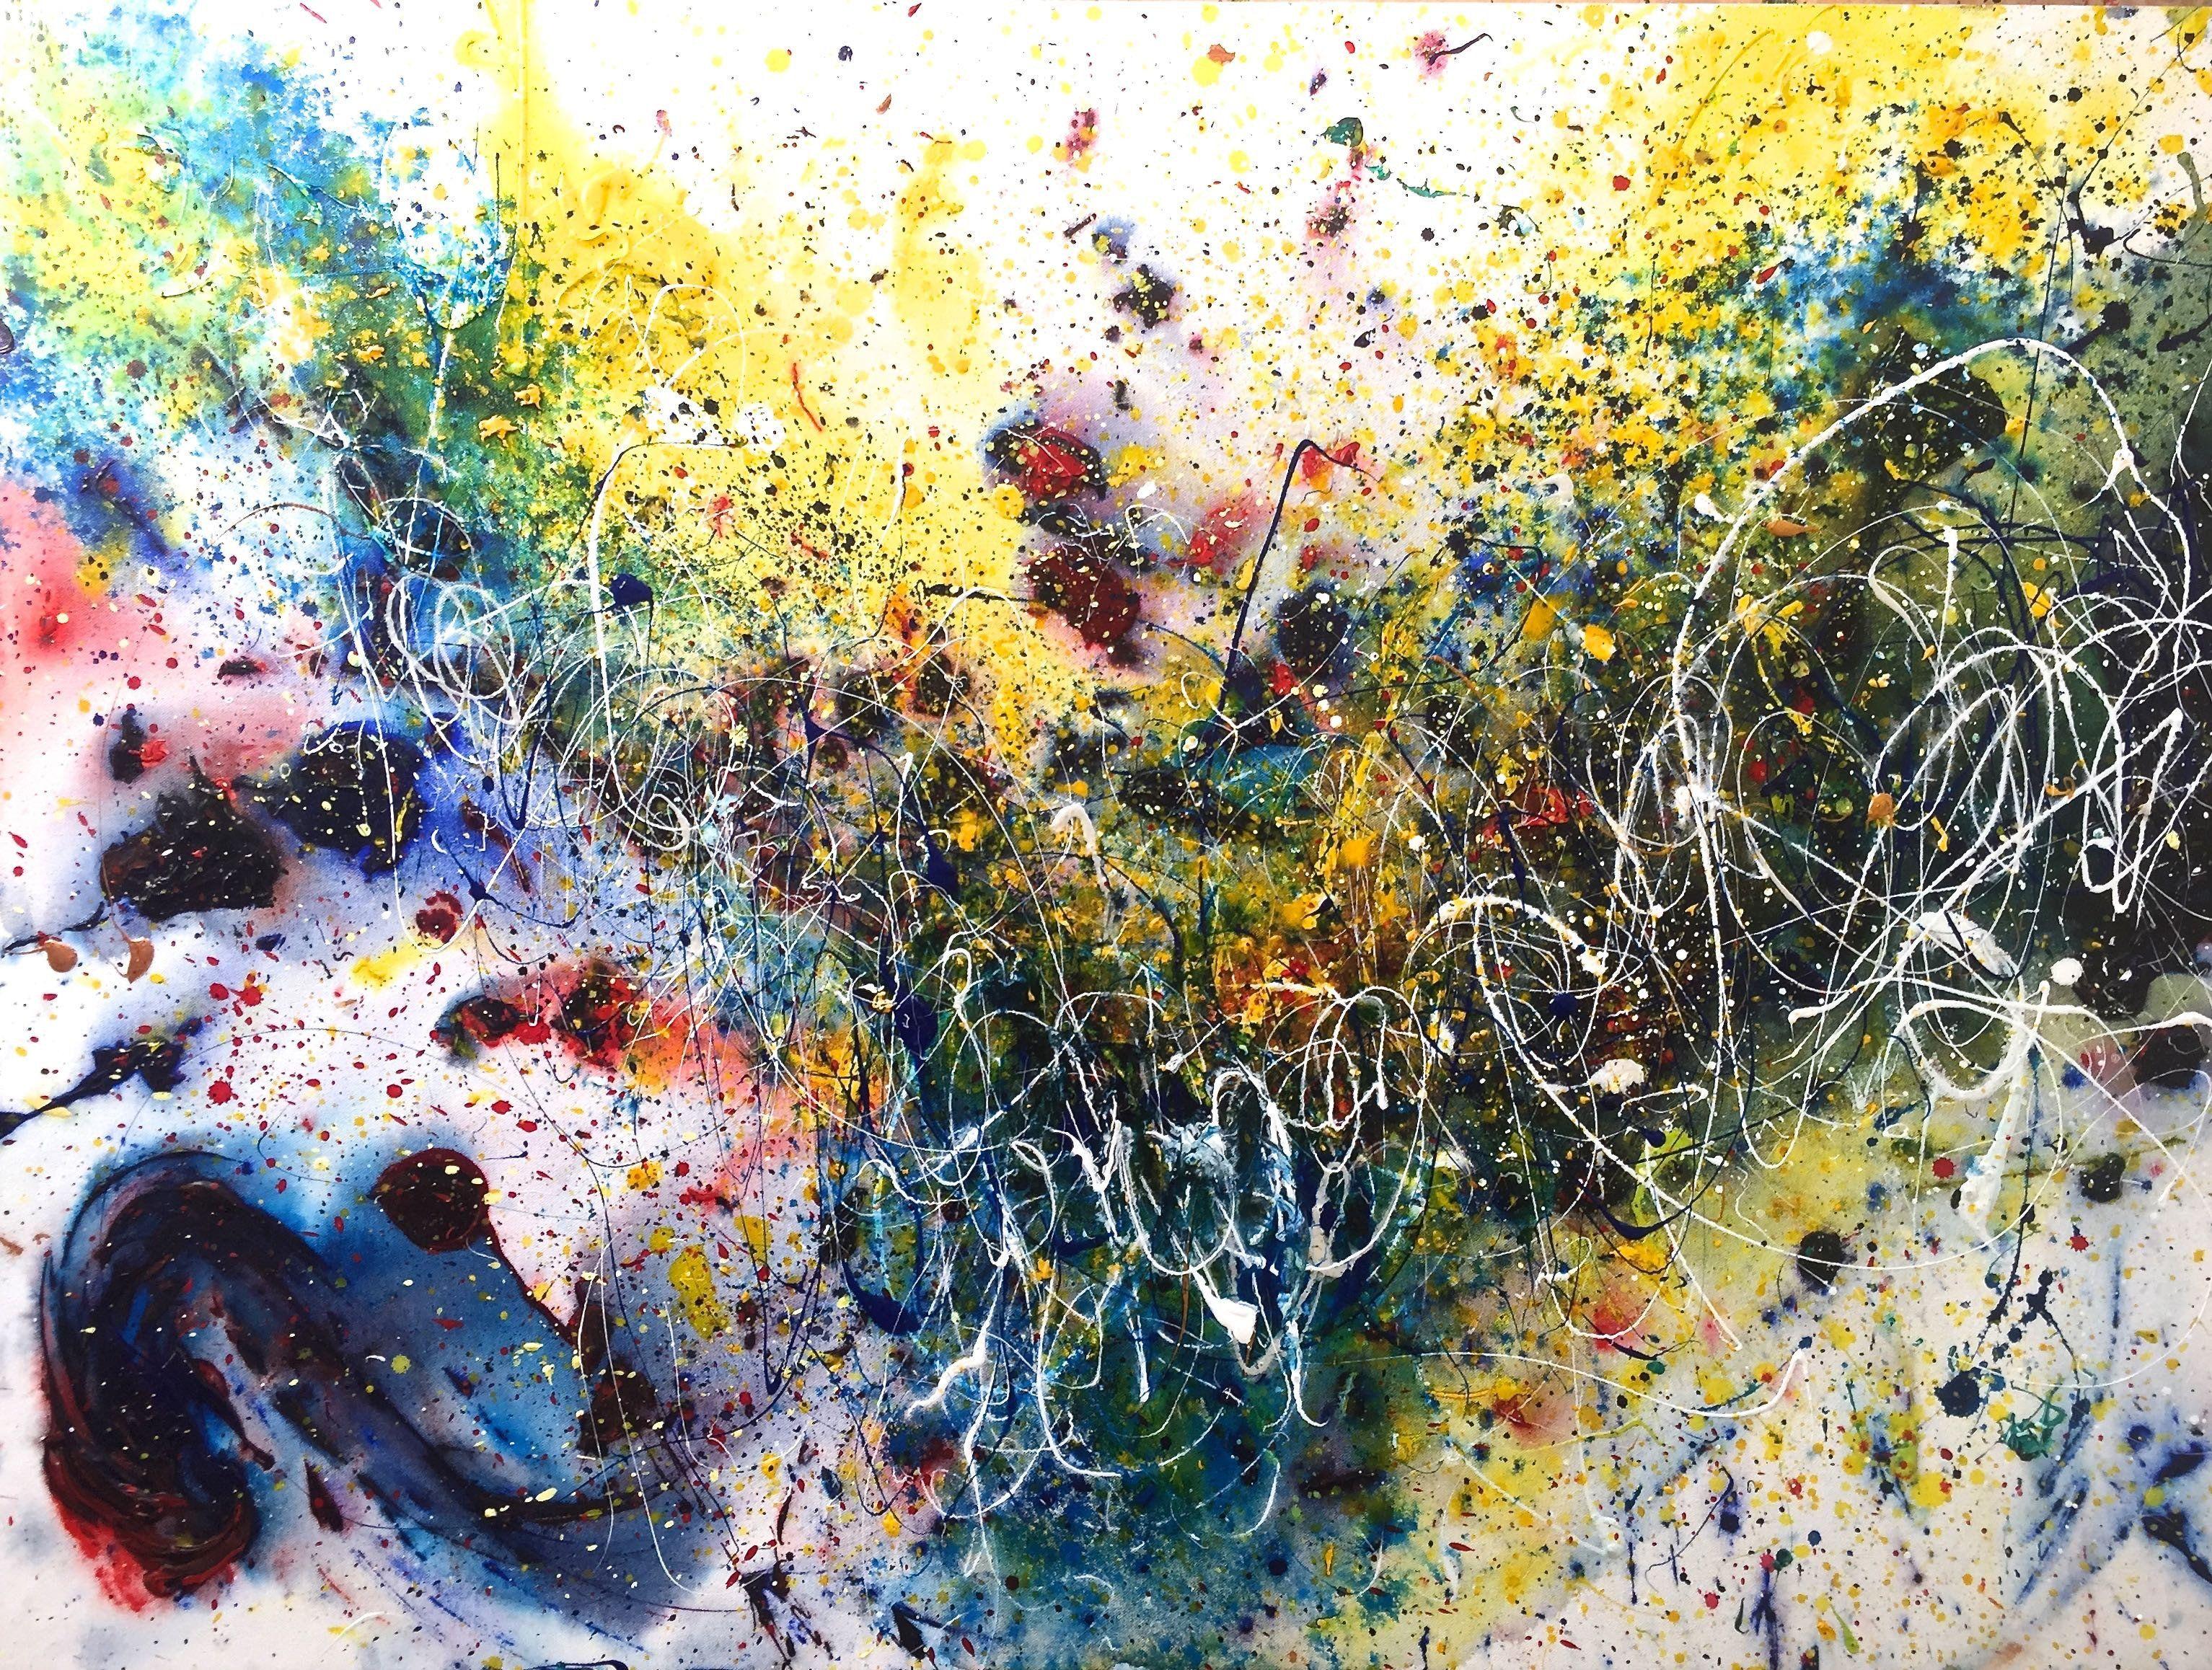 Image Du Tableau Artistes De Gigi Beauregard En 2020 Artiste